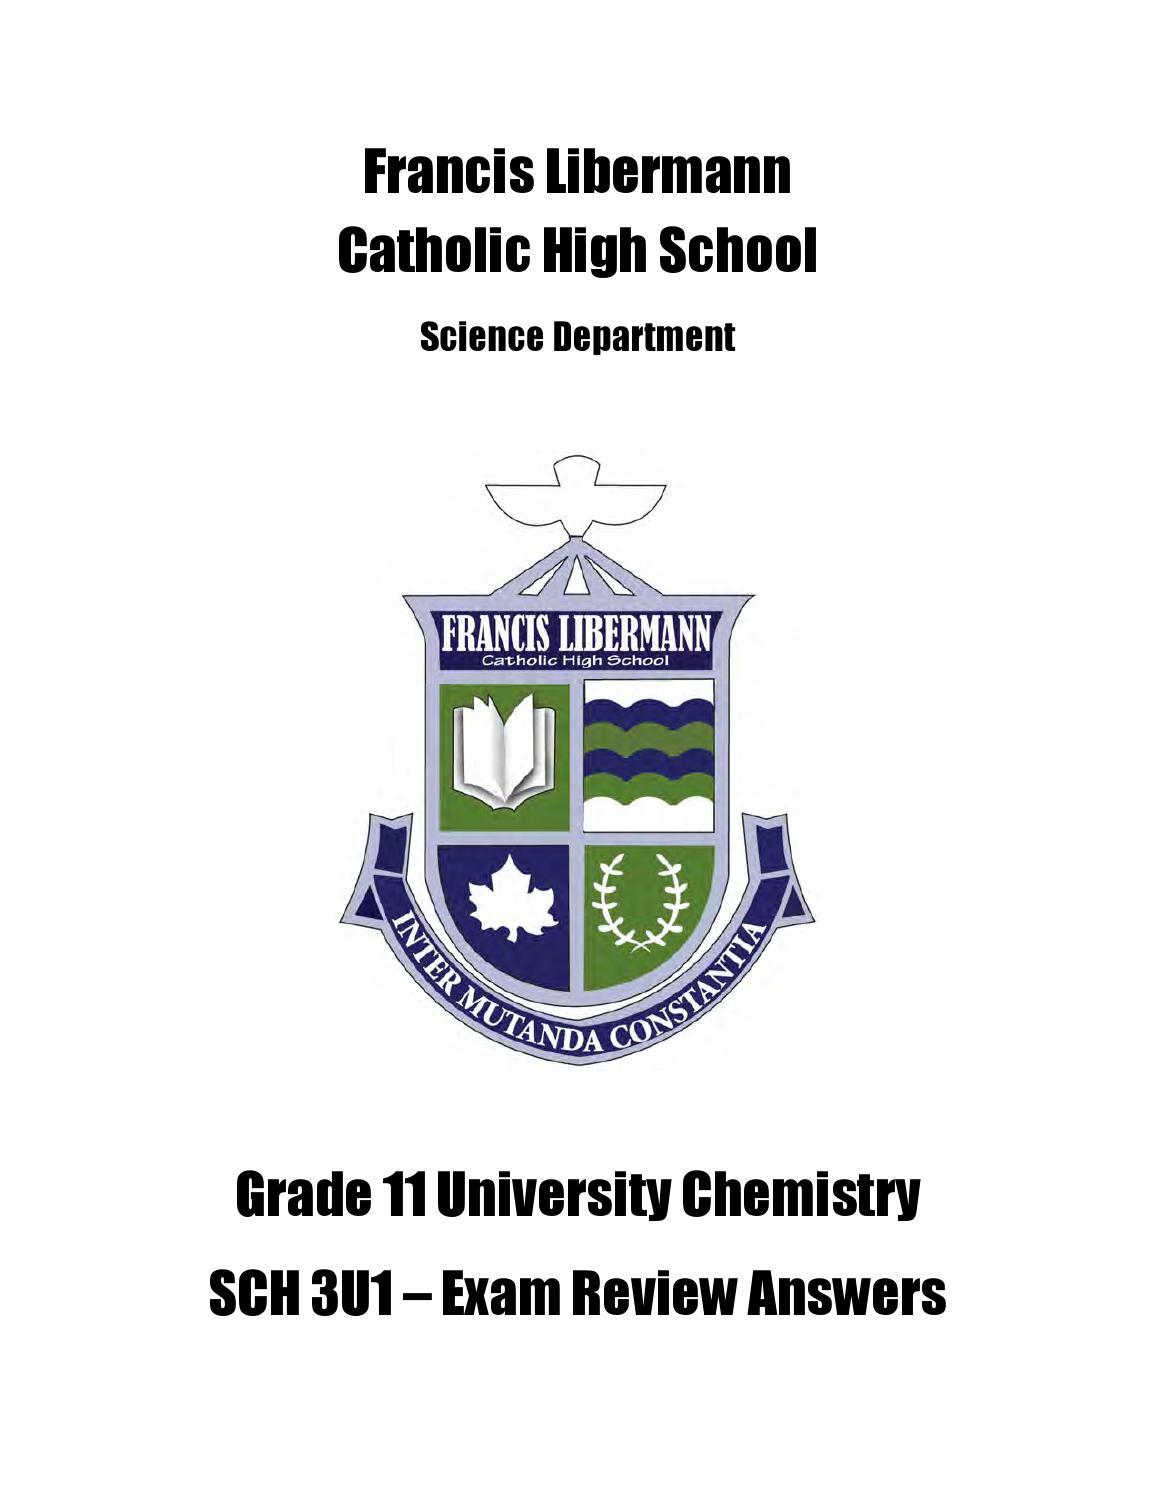 Exam Review Answers 2015 By Michael Papadimitriou Issuu